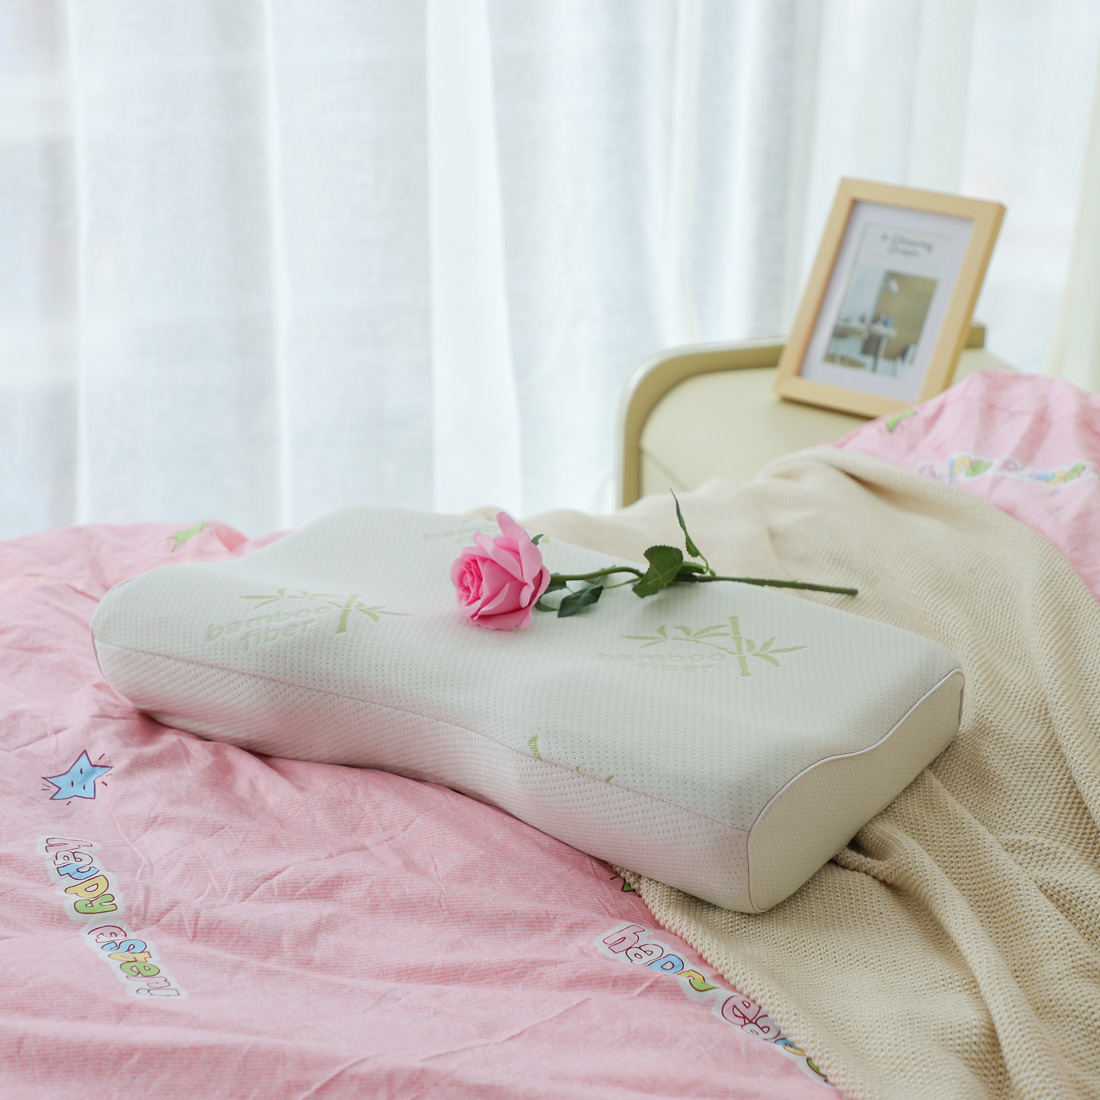 Memory Foam Standard Contour Pillow ! Bamboo Fiber for Side Back Sleepers